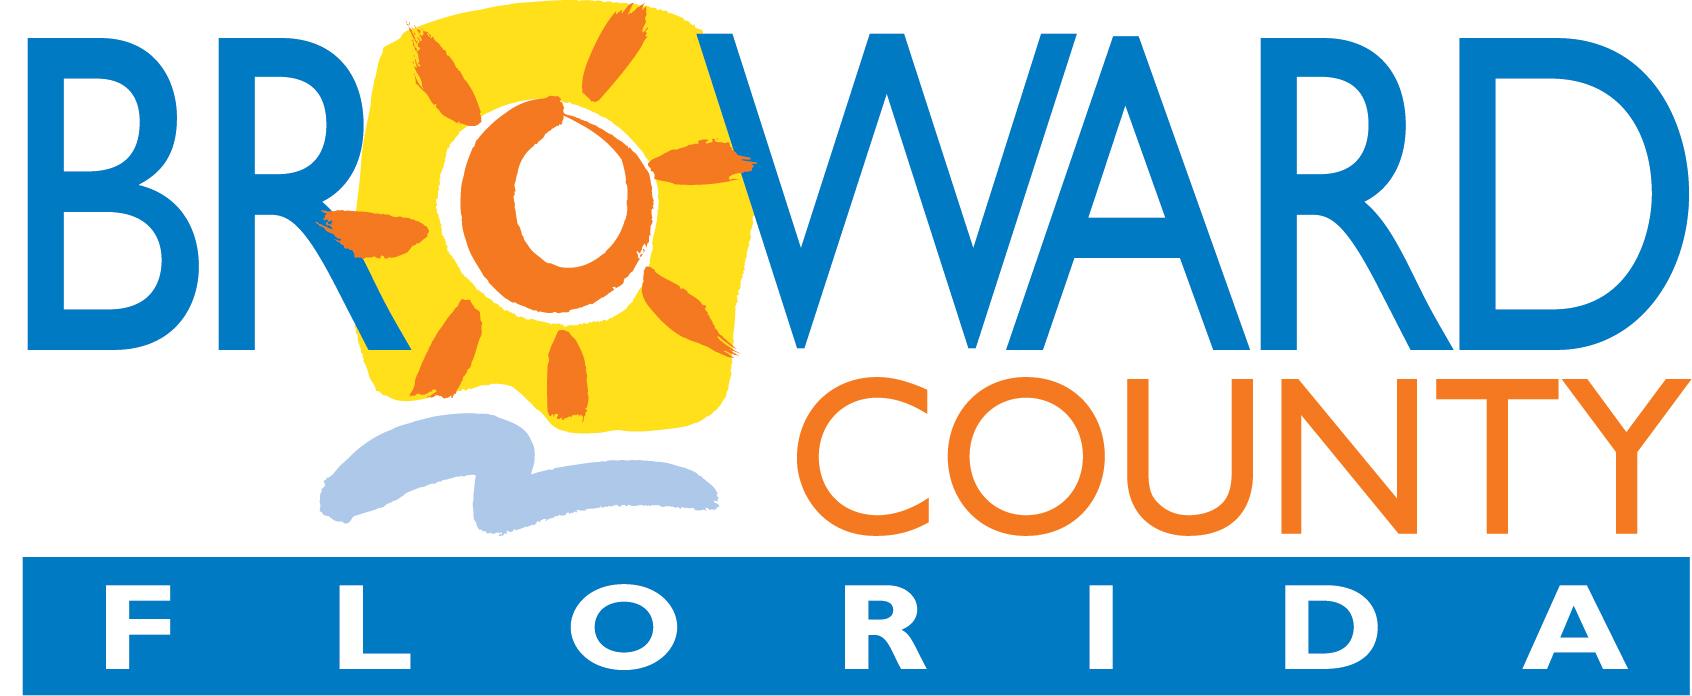 Broward County logo jpg